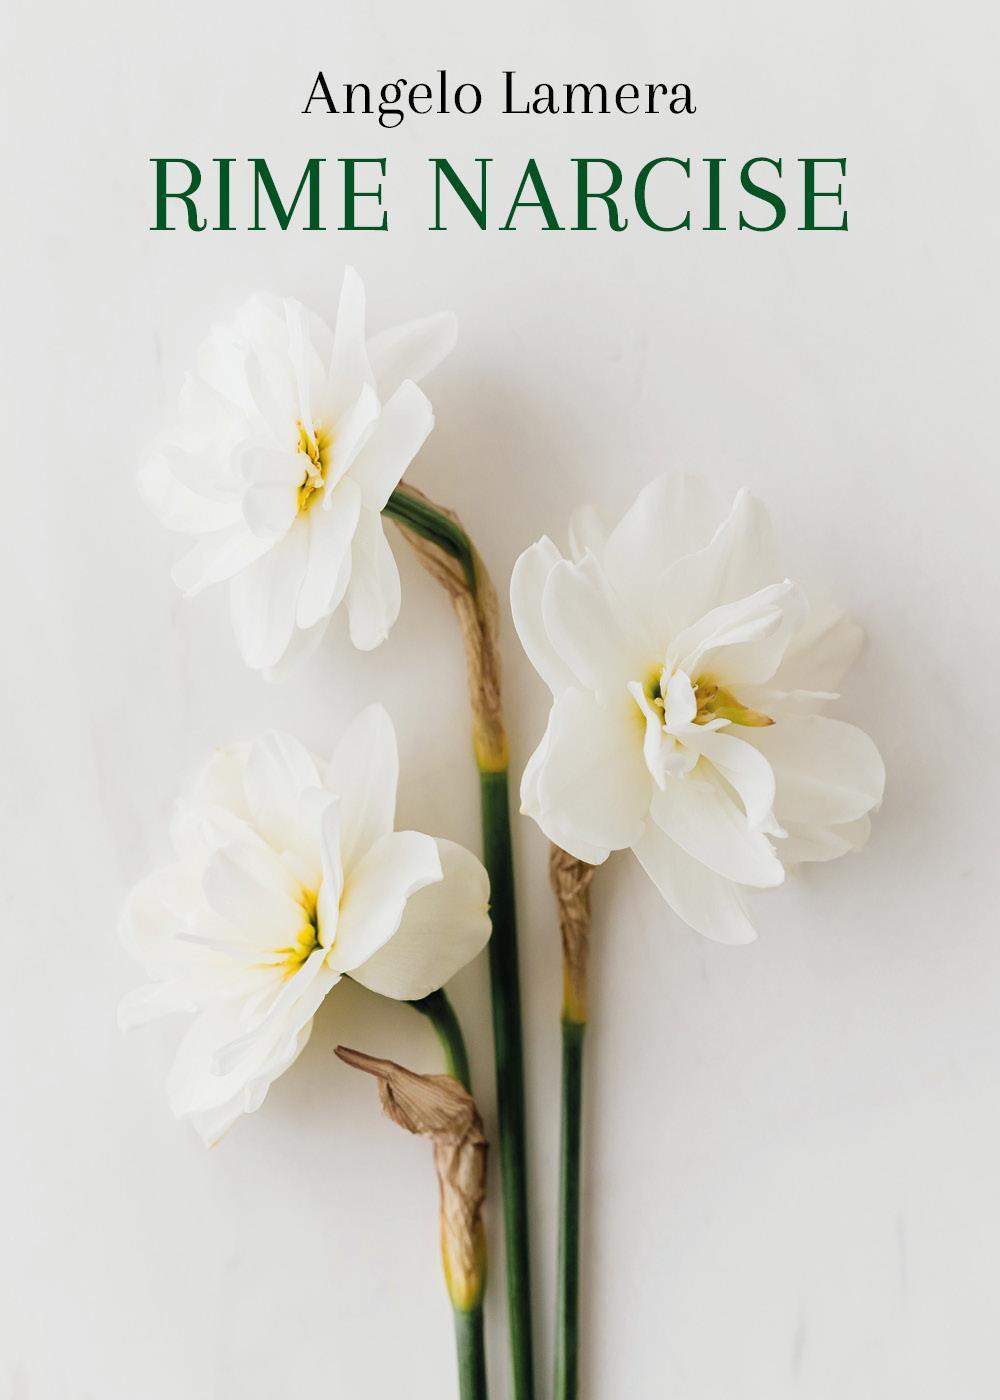 Rime narcise